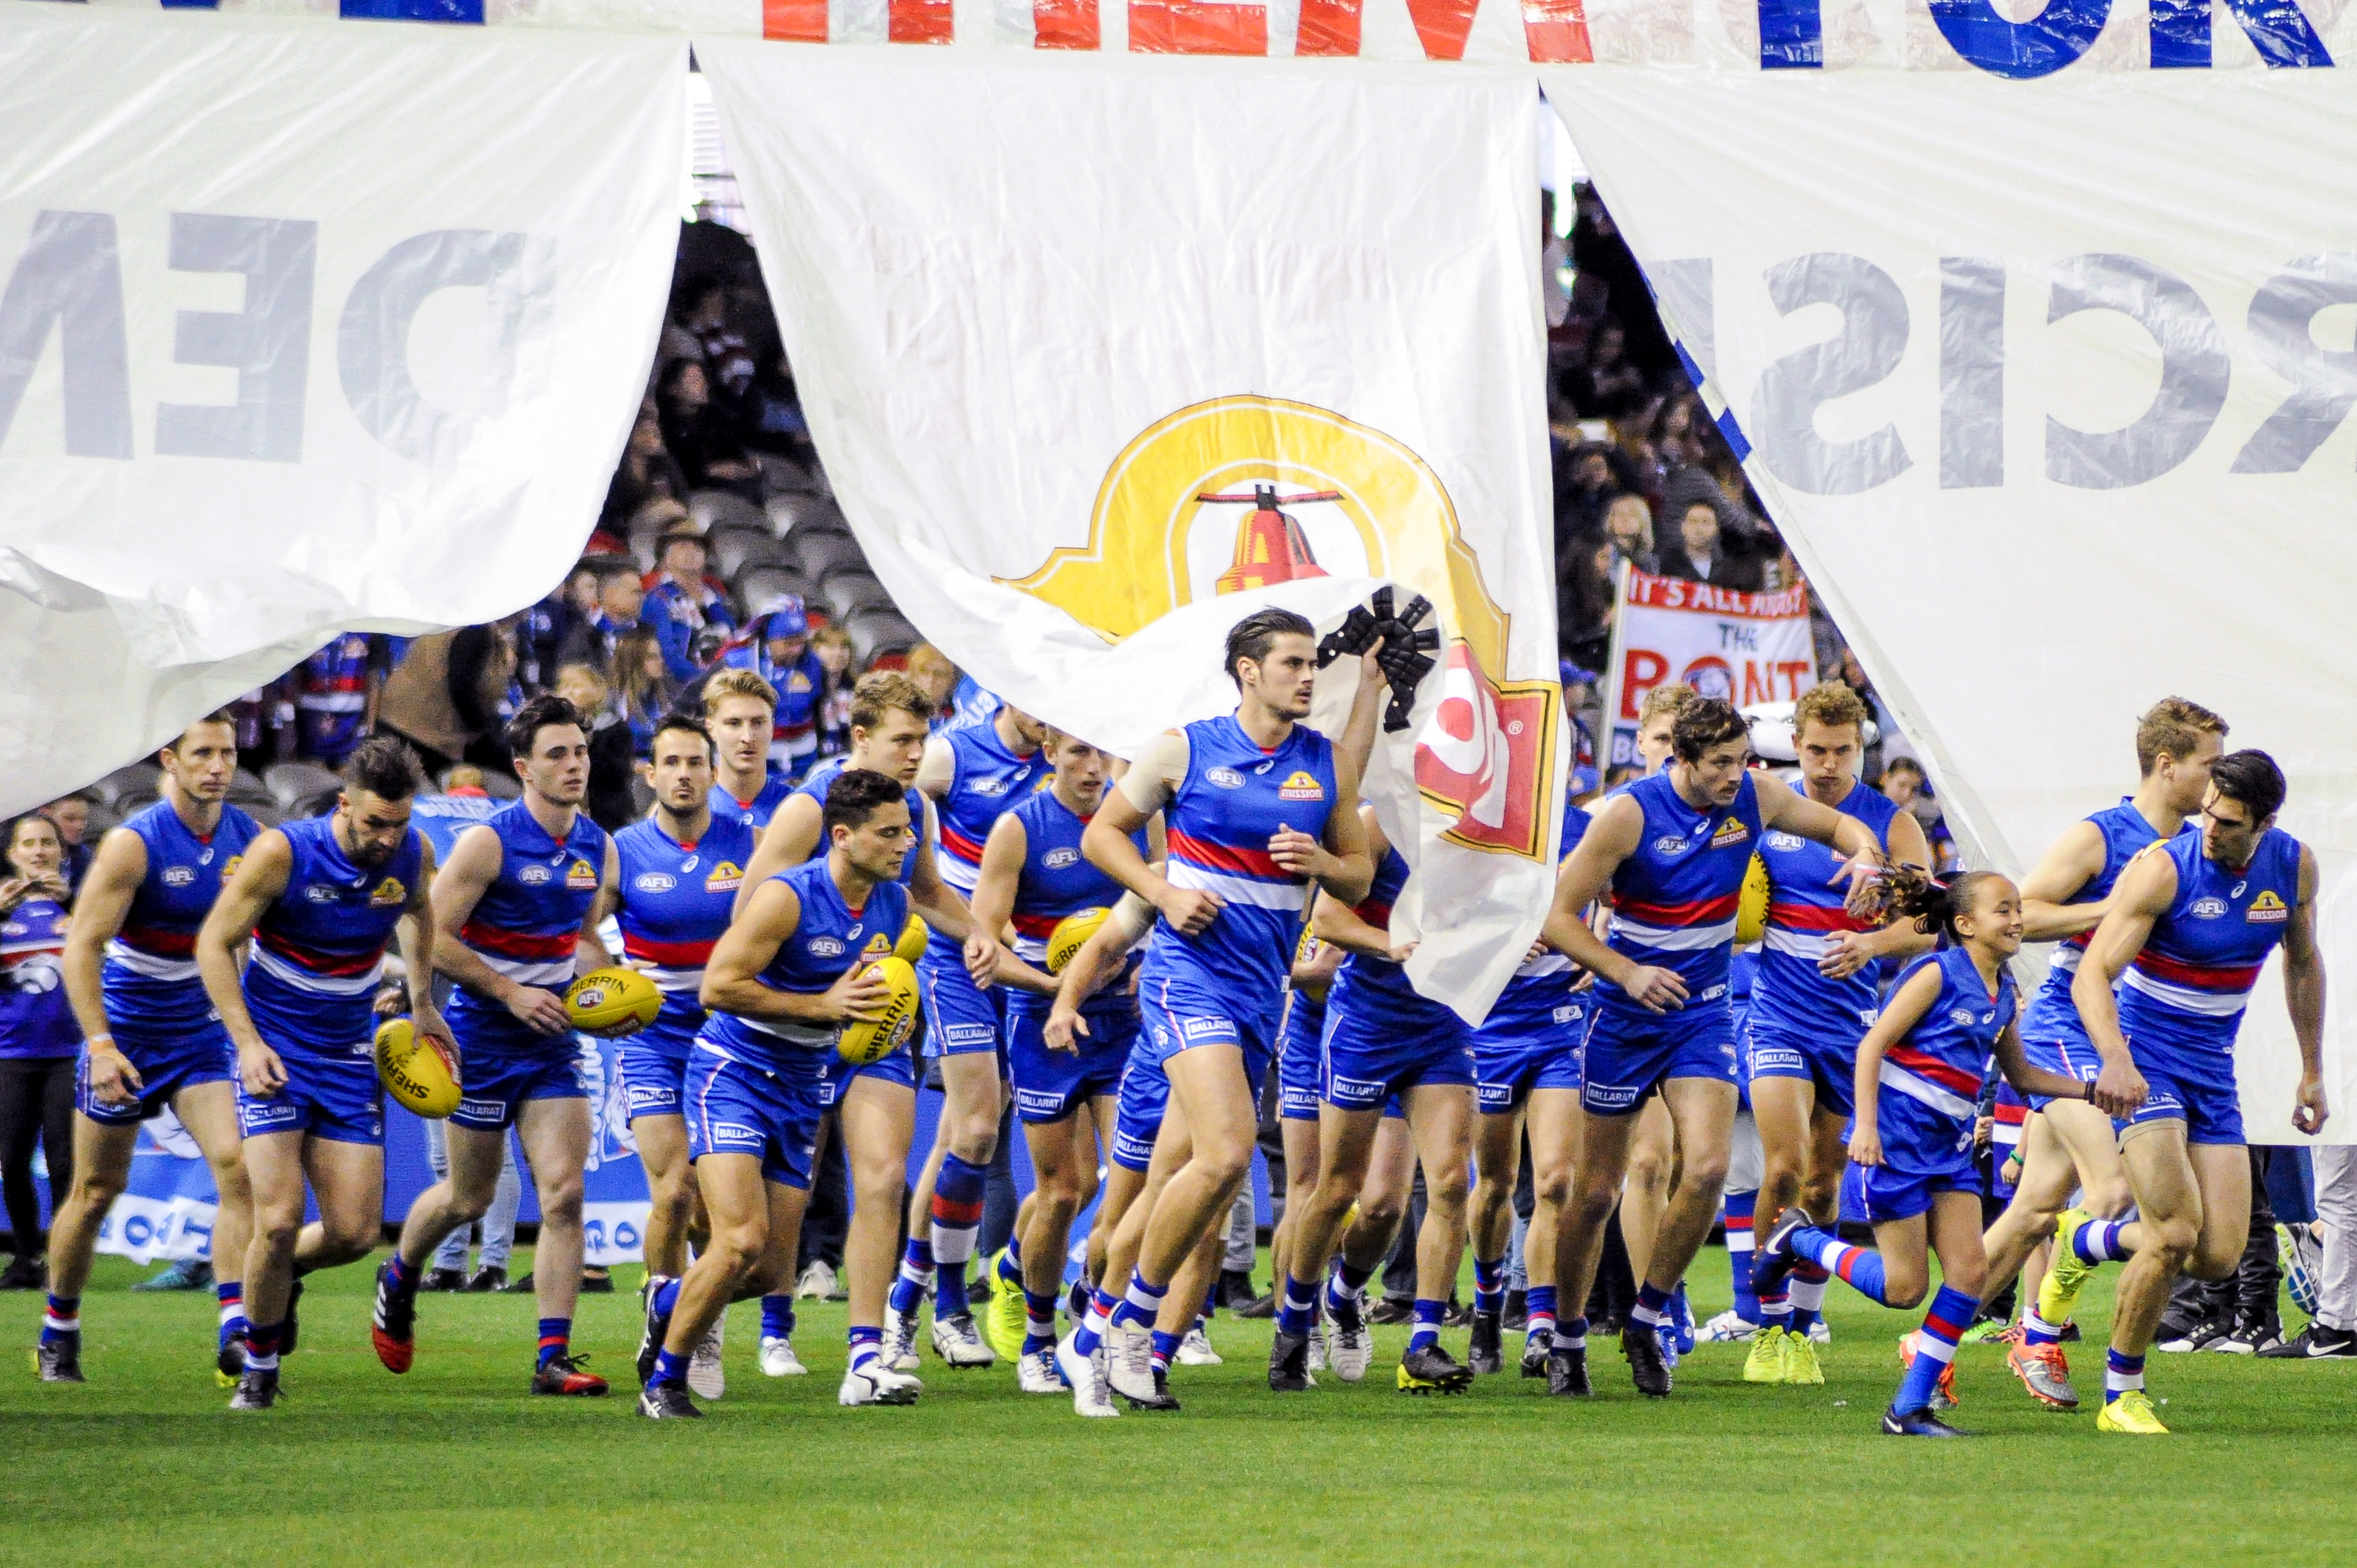 Fremantle Dockers vs Western Bulldogs preview?